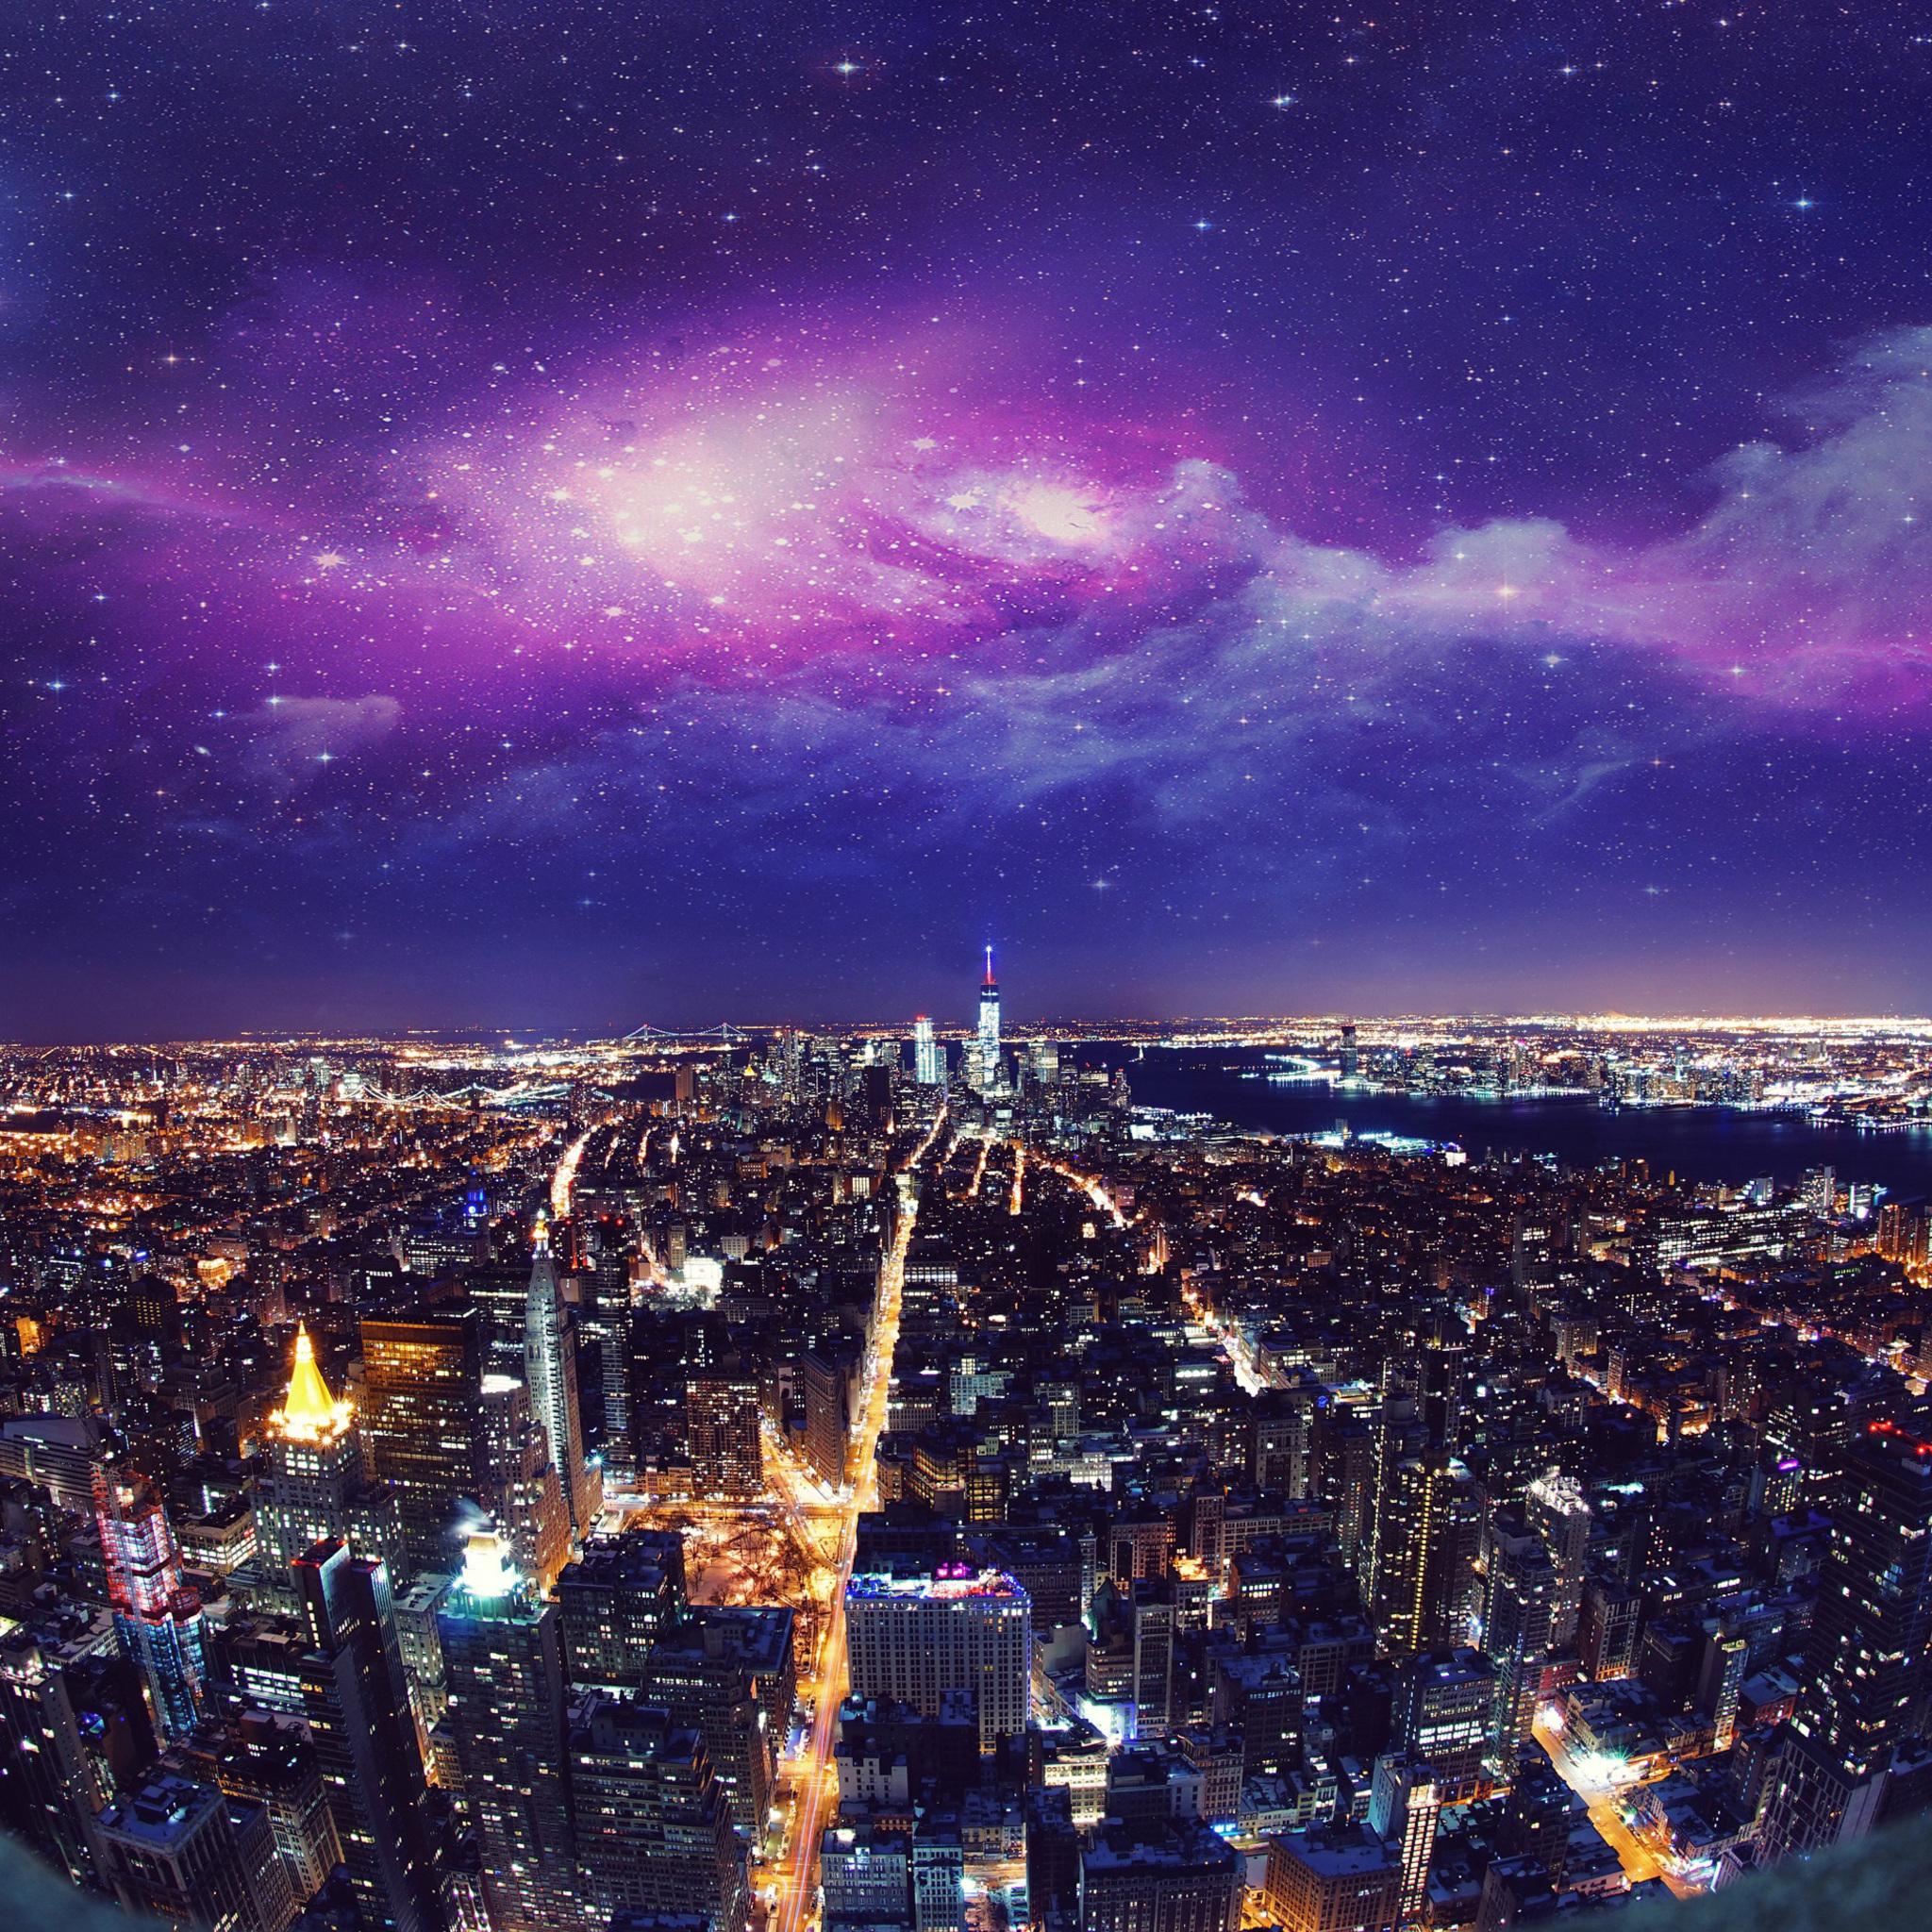 2048x2048 usa new york city night 4k ipad air hd 4k wallpapers usa new york city night 4k iqg voltagebd Images